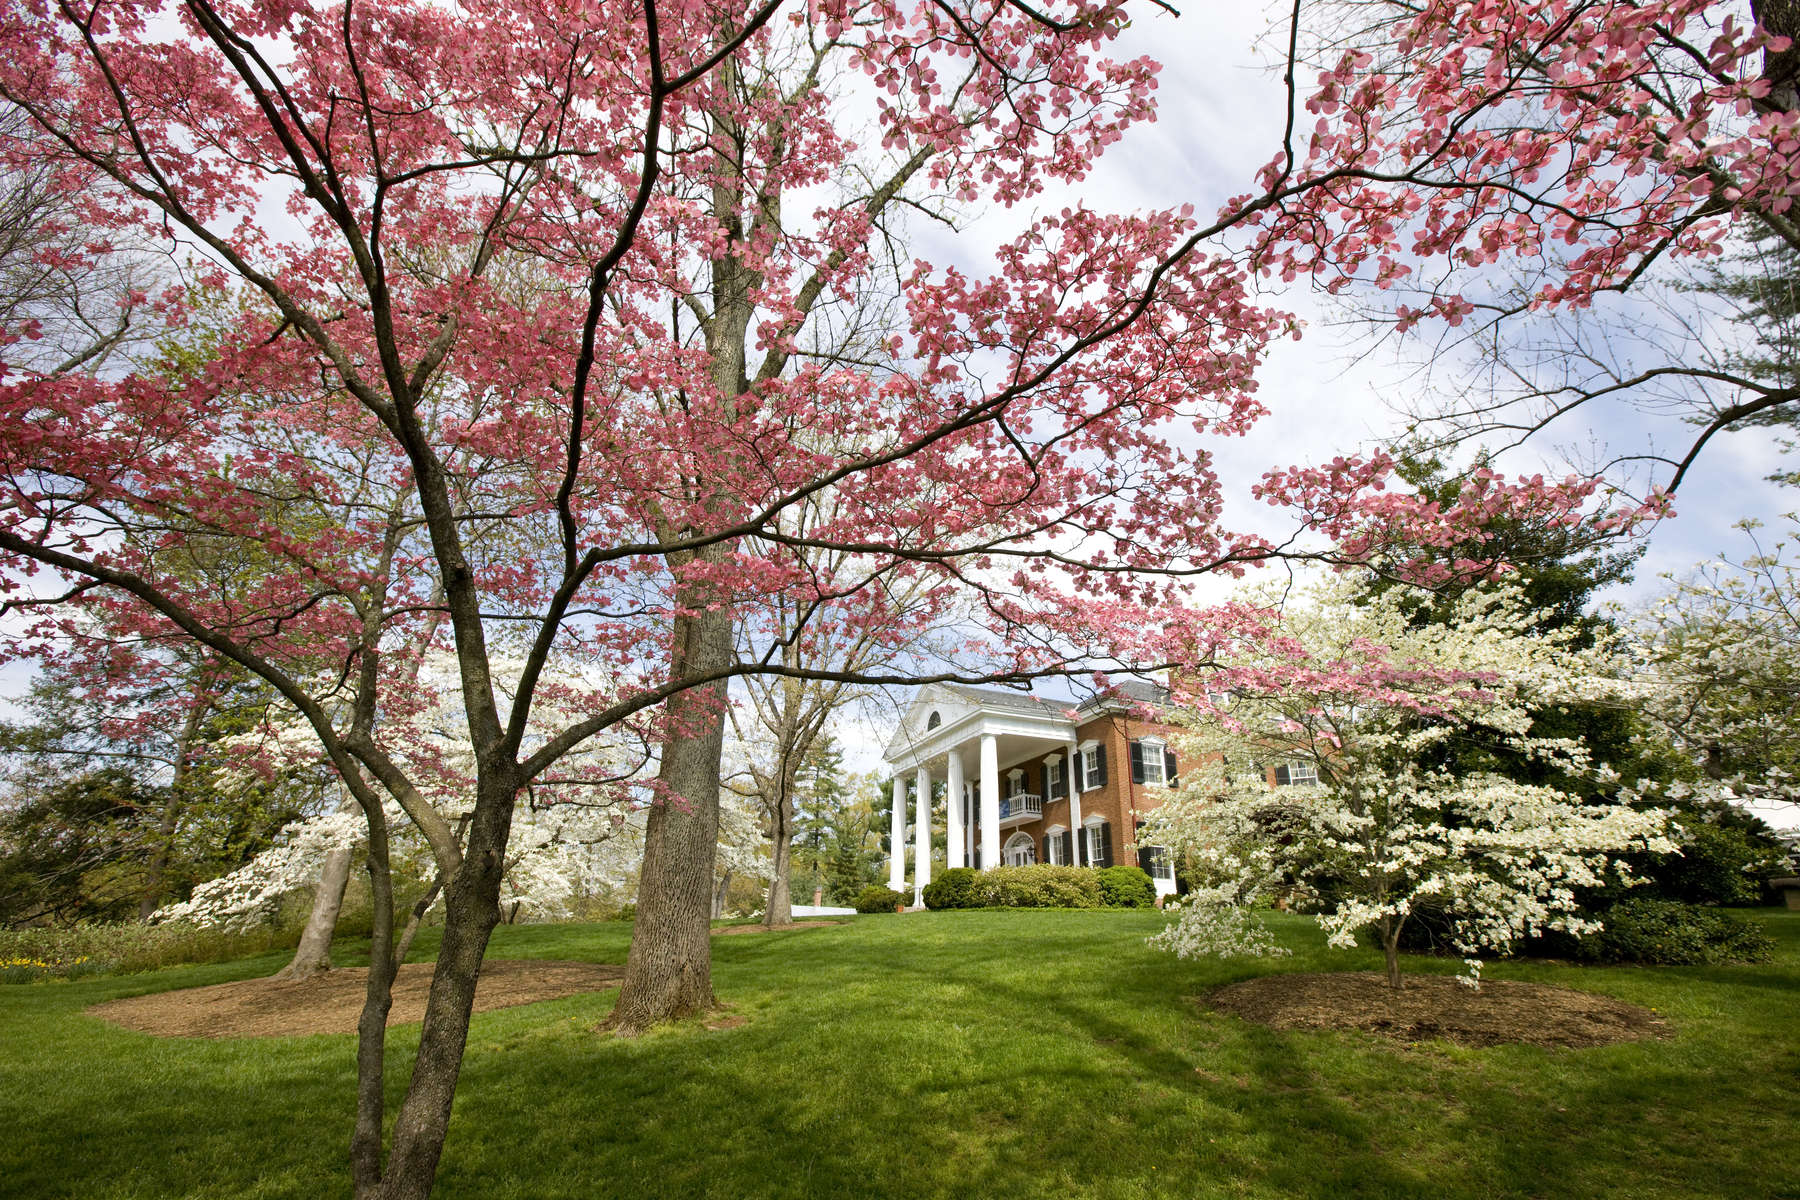 Spring_Carrs_Hill_08HR_DA